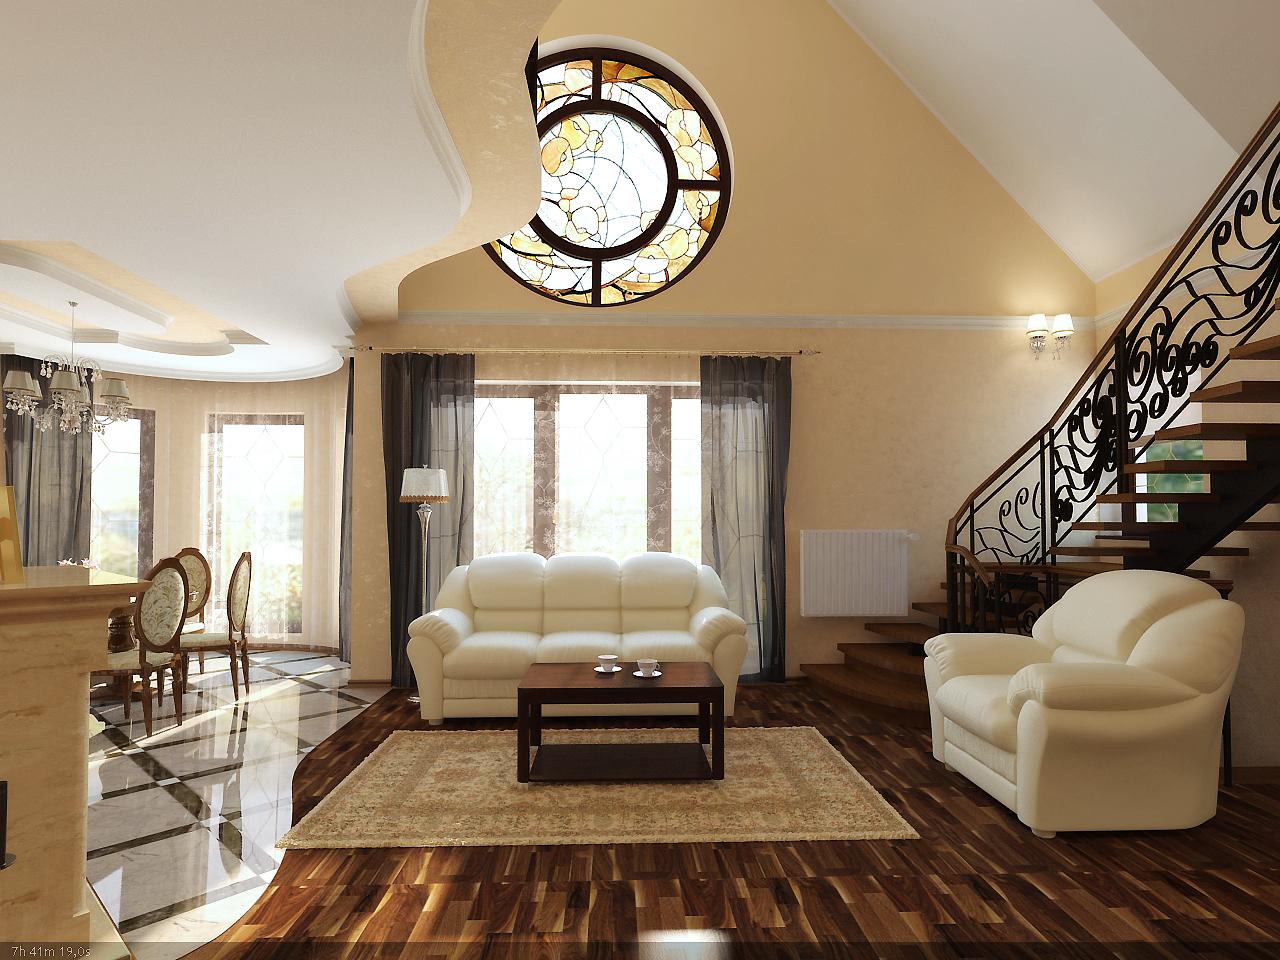 New home designs latest.: Modern homes interior decoration ... on Modern House Ideas Interior  id=91479